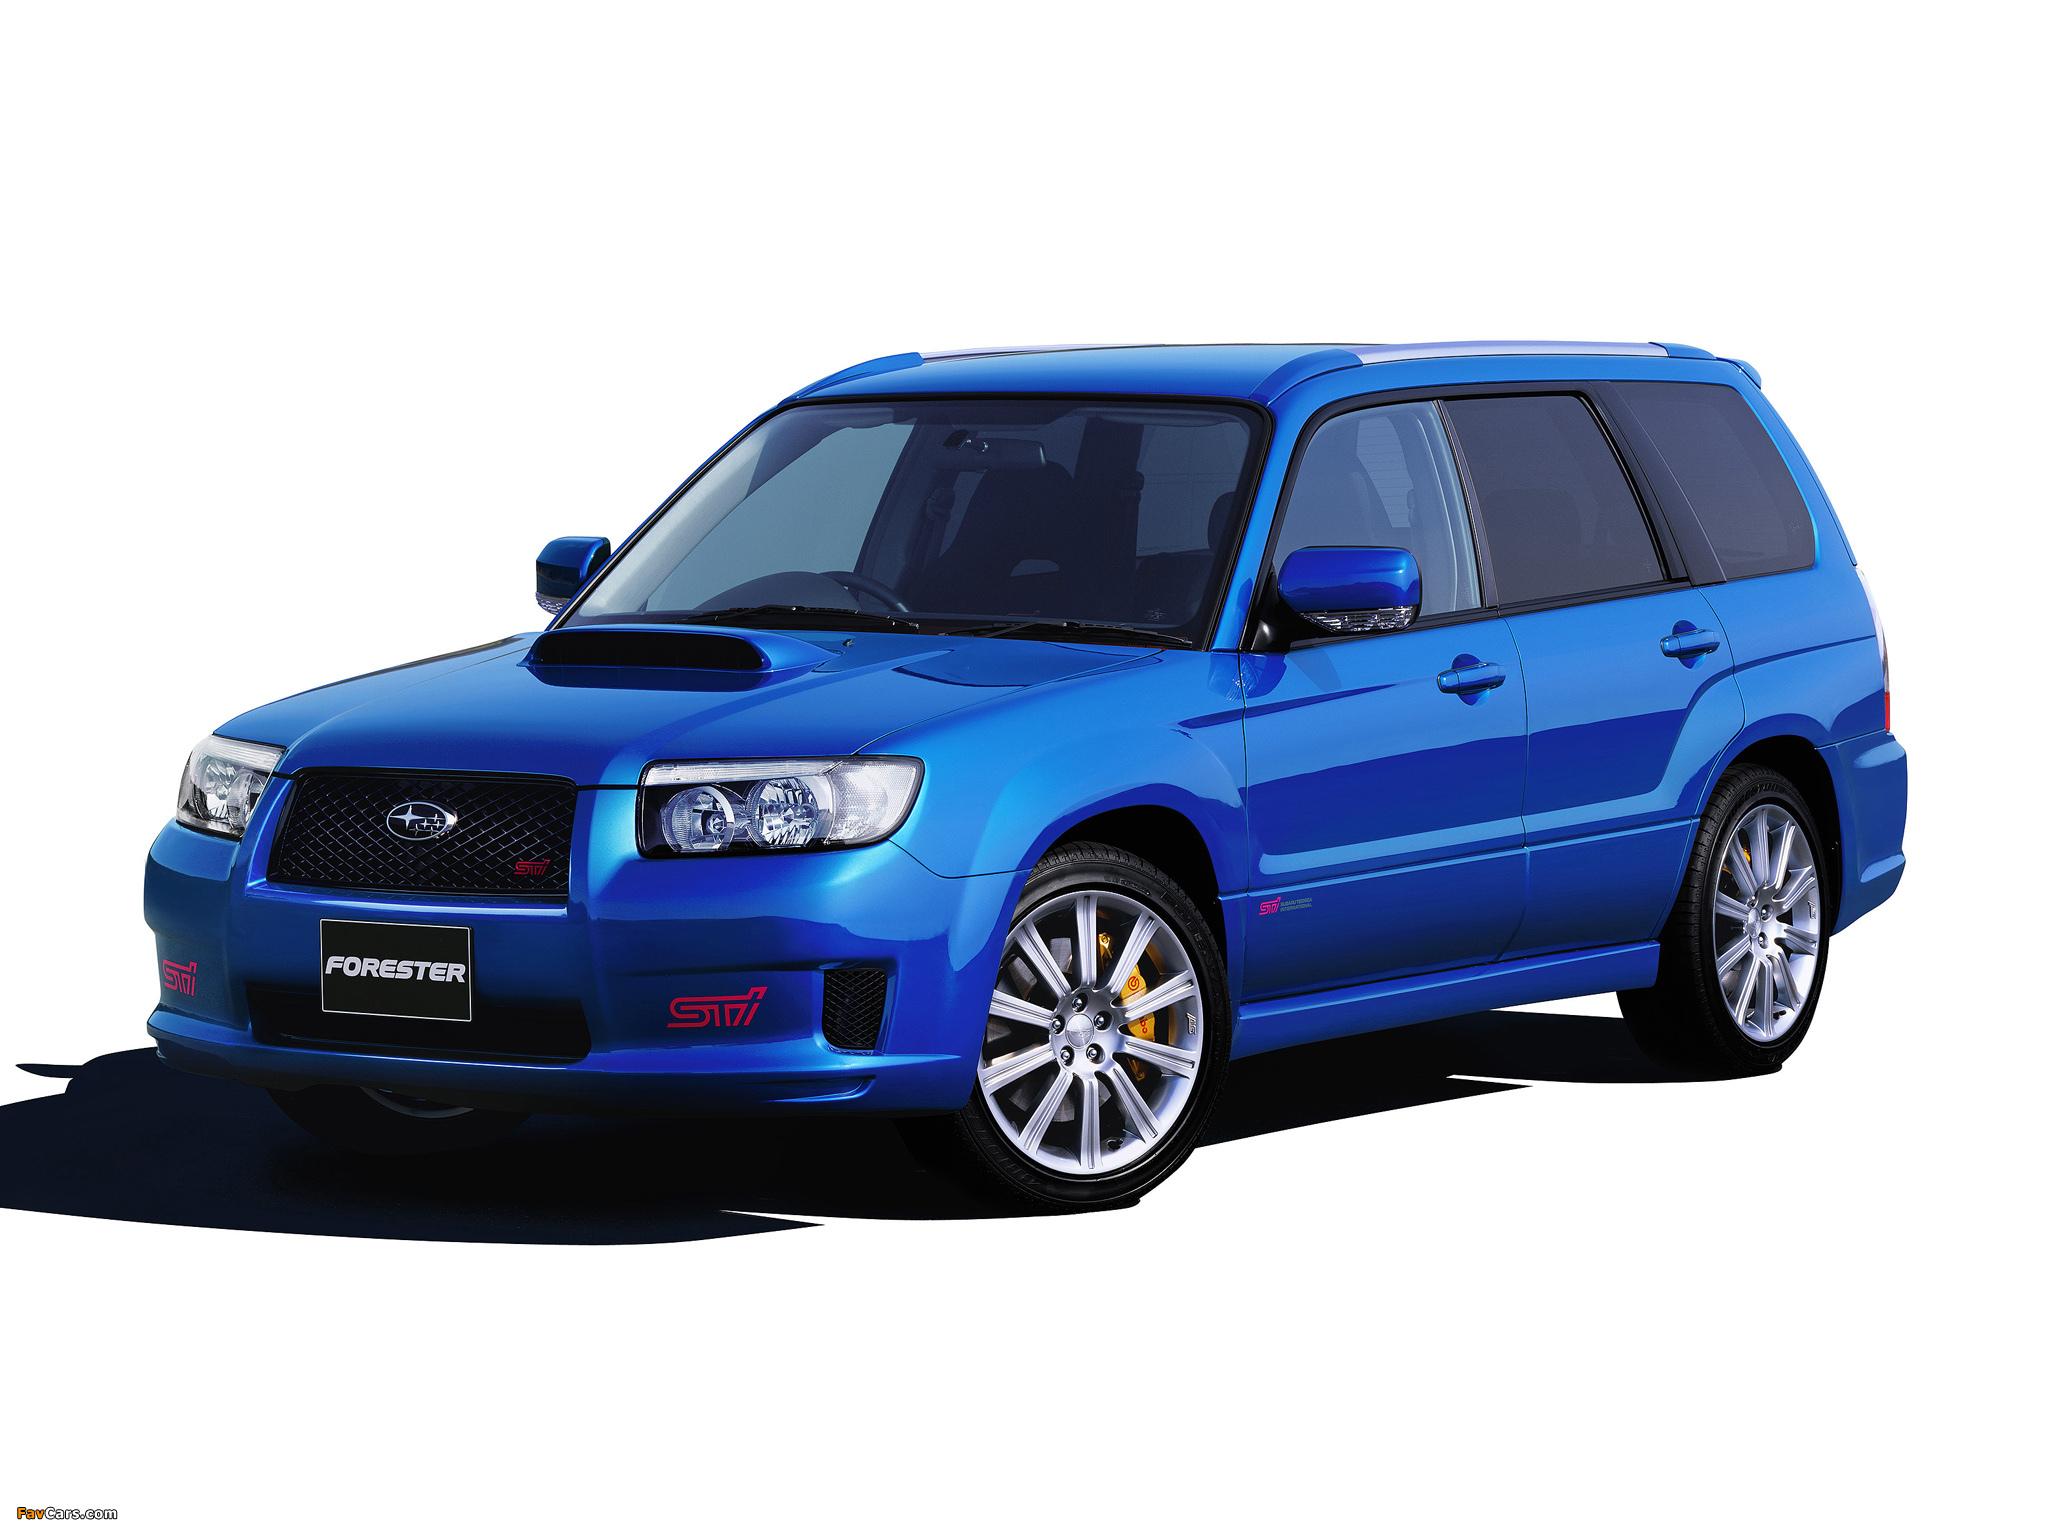 Subaru Forester Sti 2005 08 Wallpapers 2048x1536